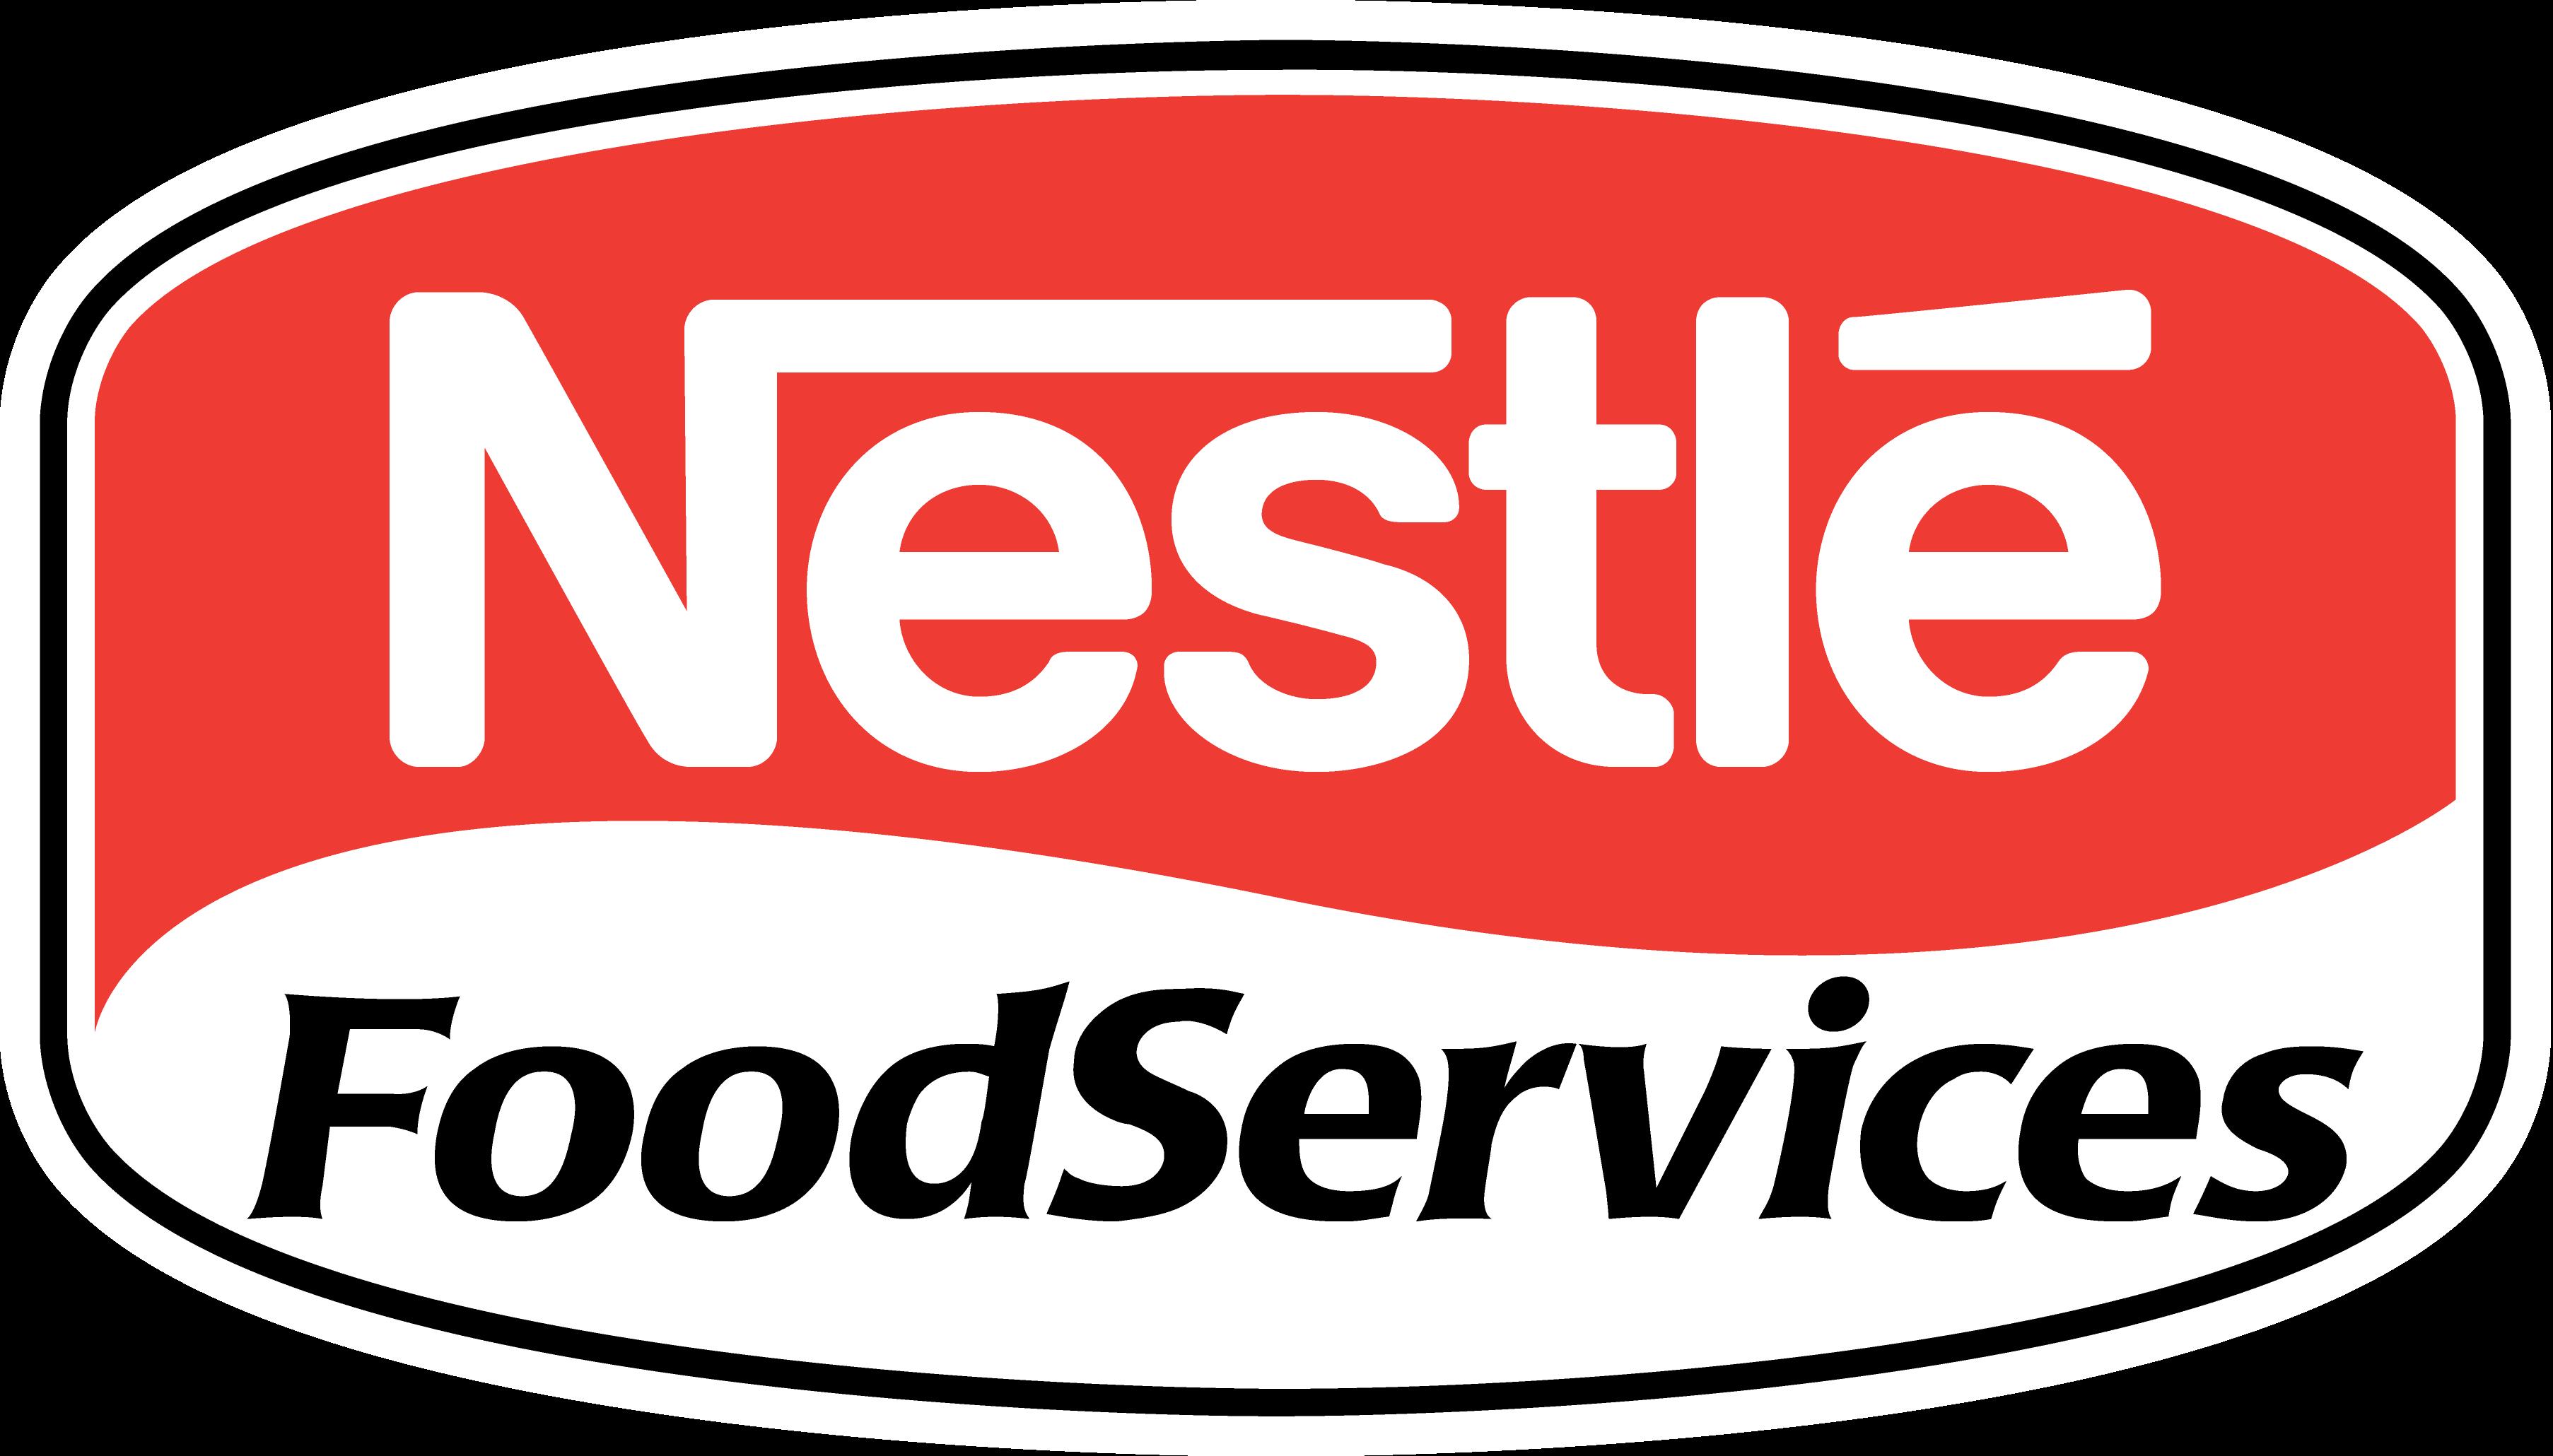 Nestle Food Services Logo Pinterest Logos And Logo Branding